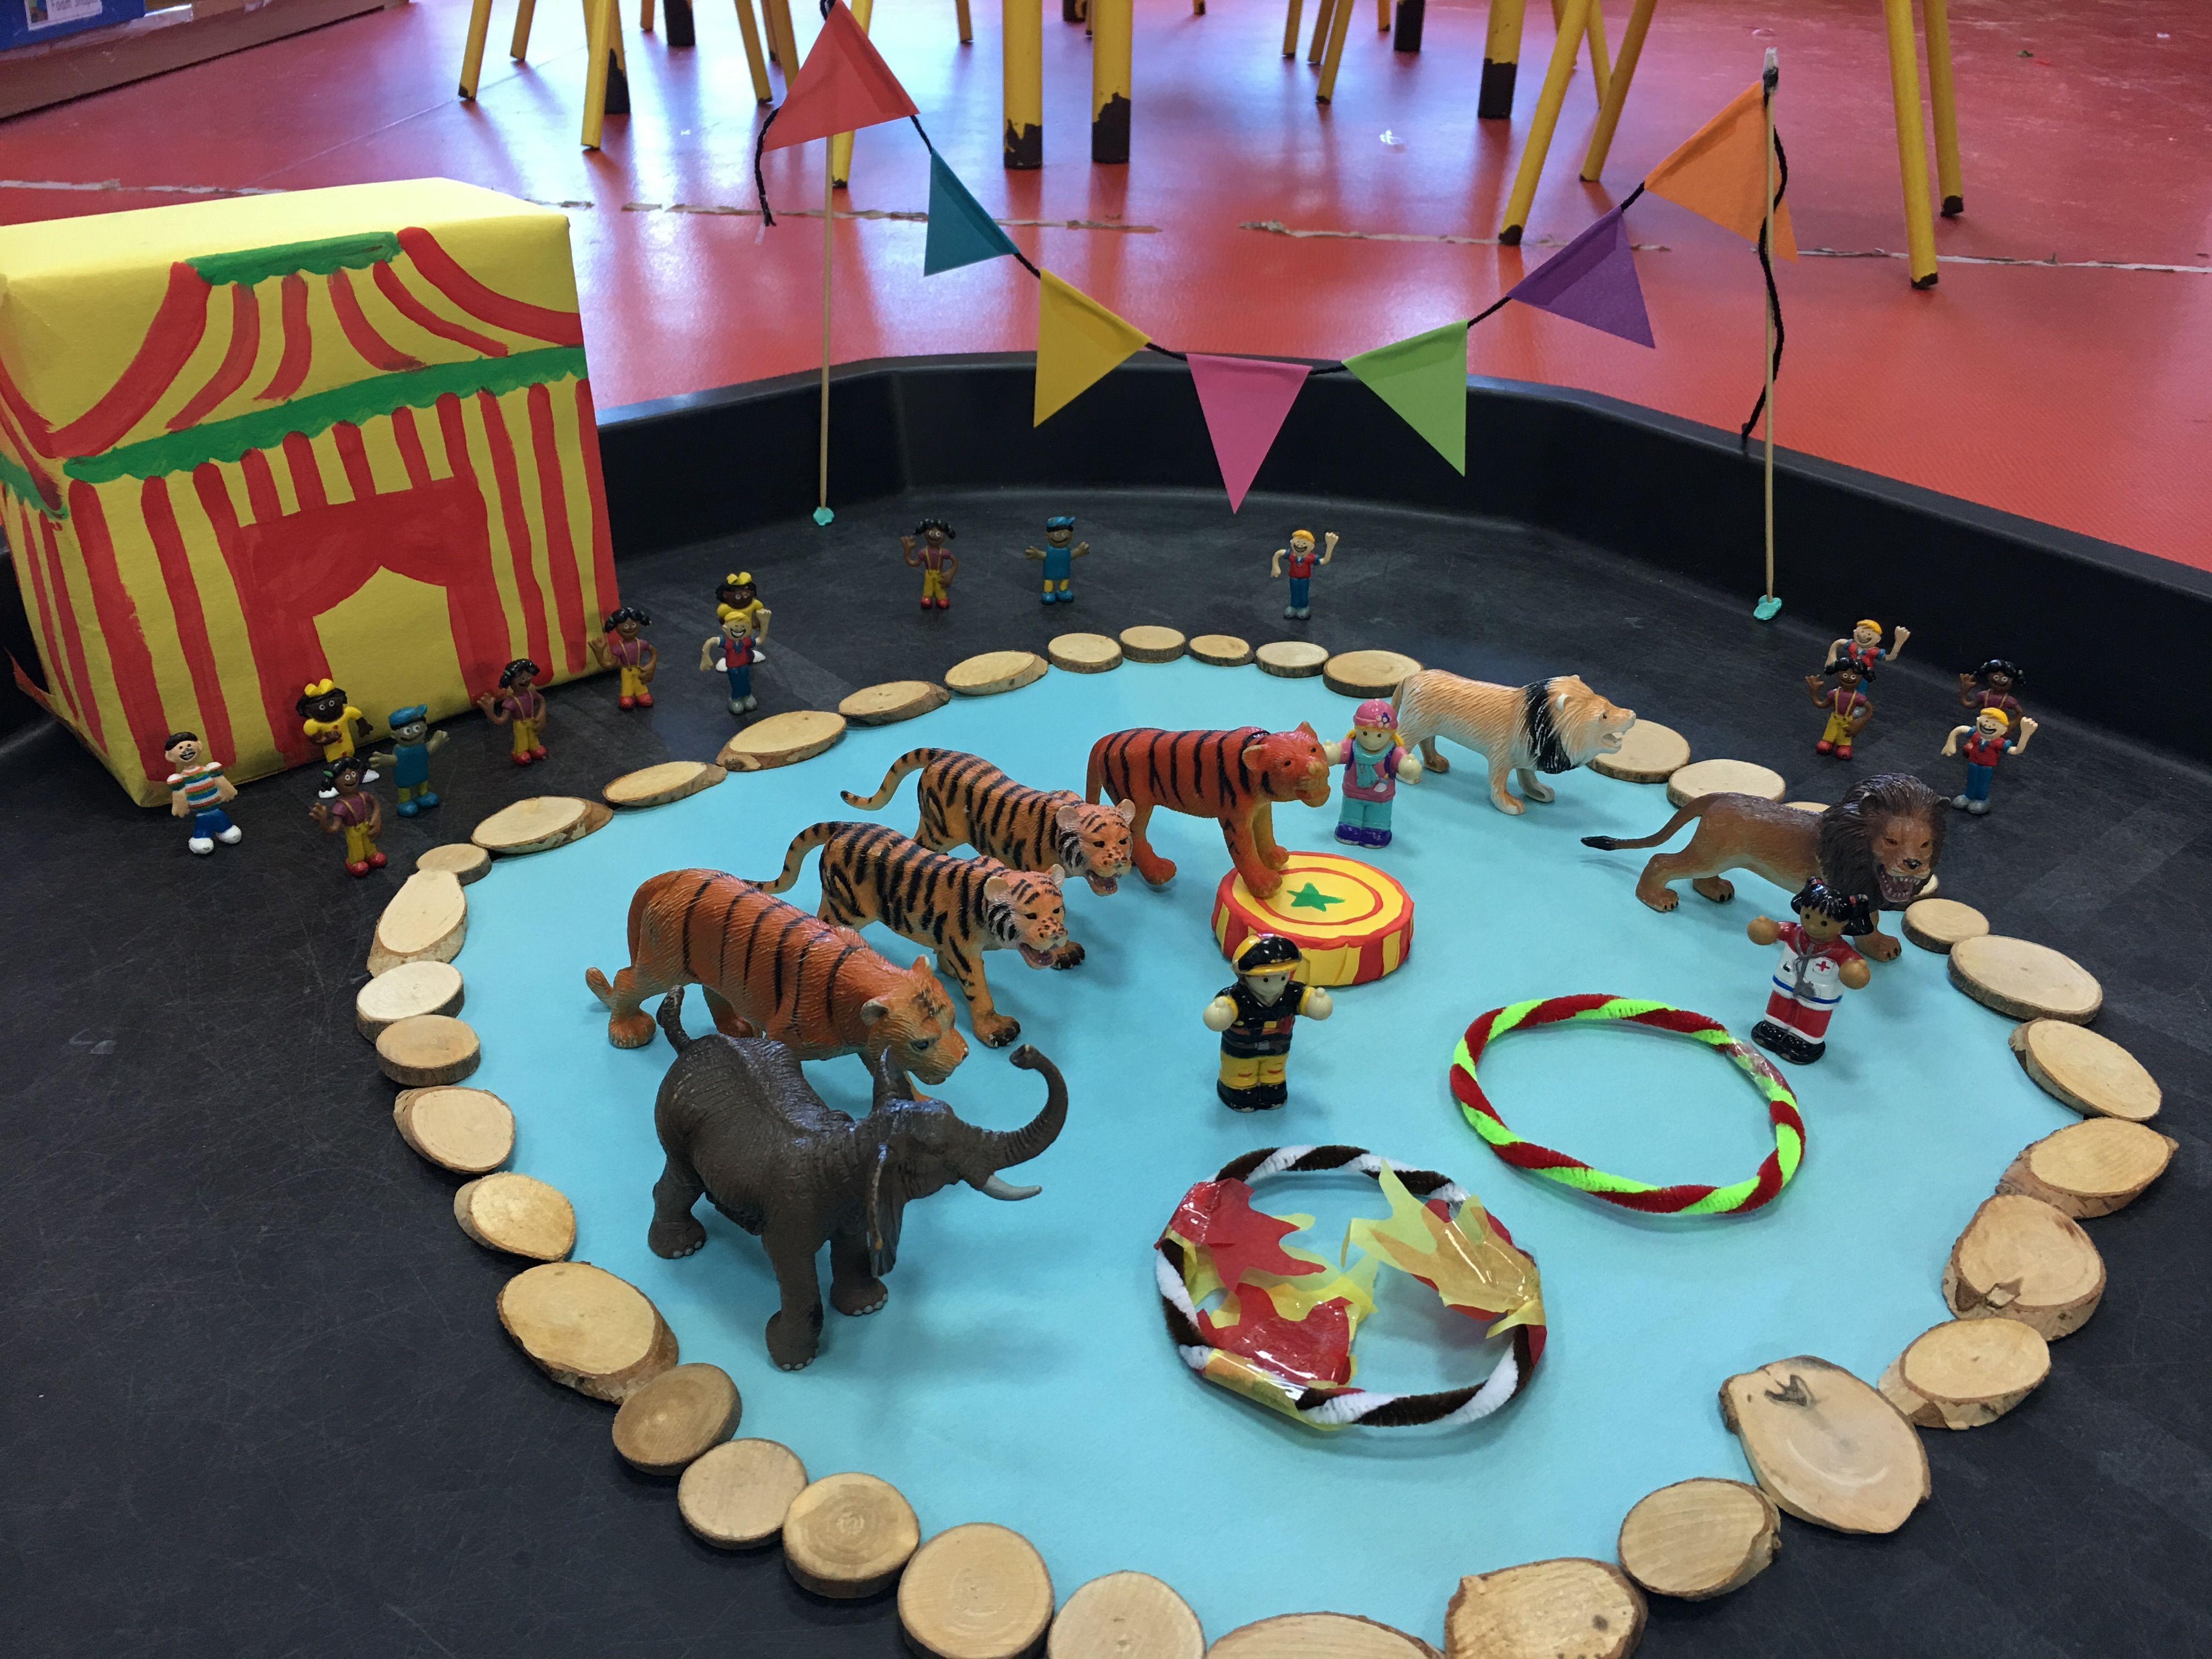 Circus R5 Tuff tray, Table decorations, Decor